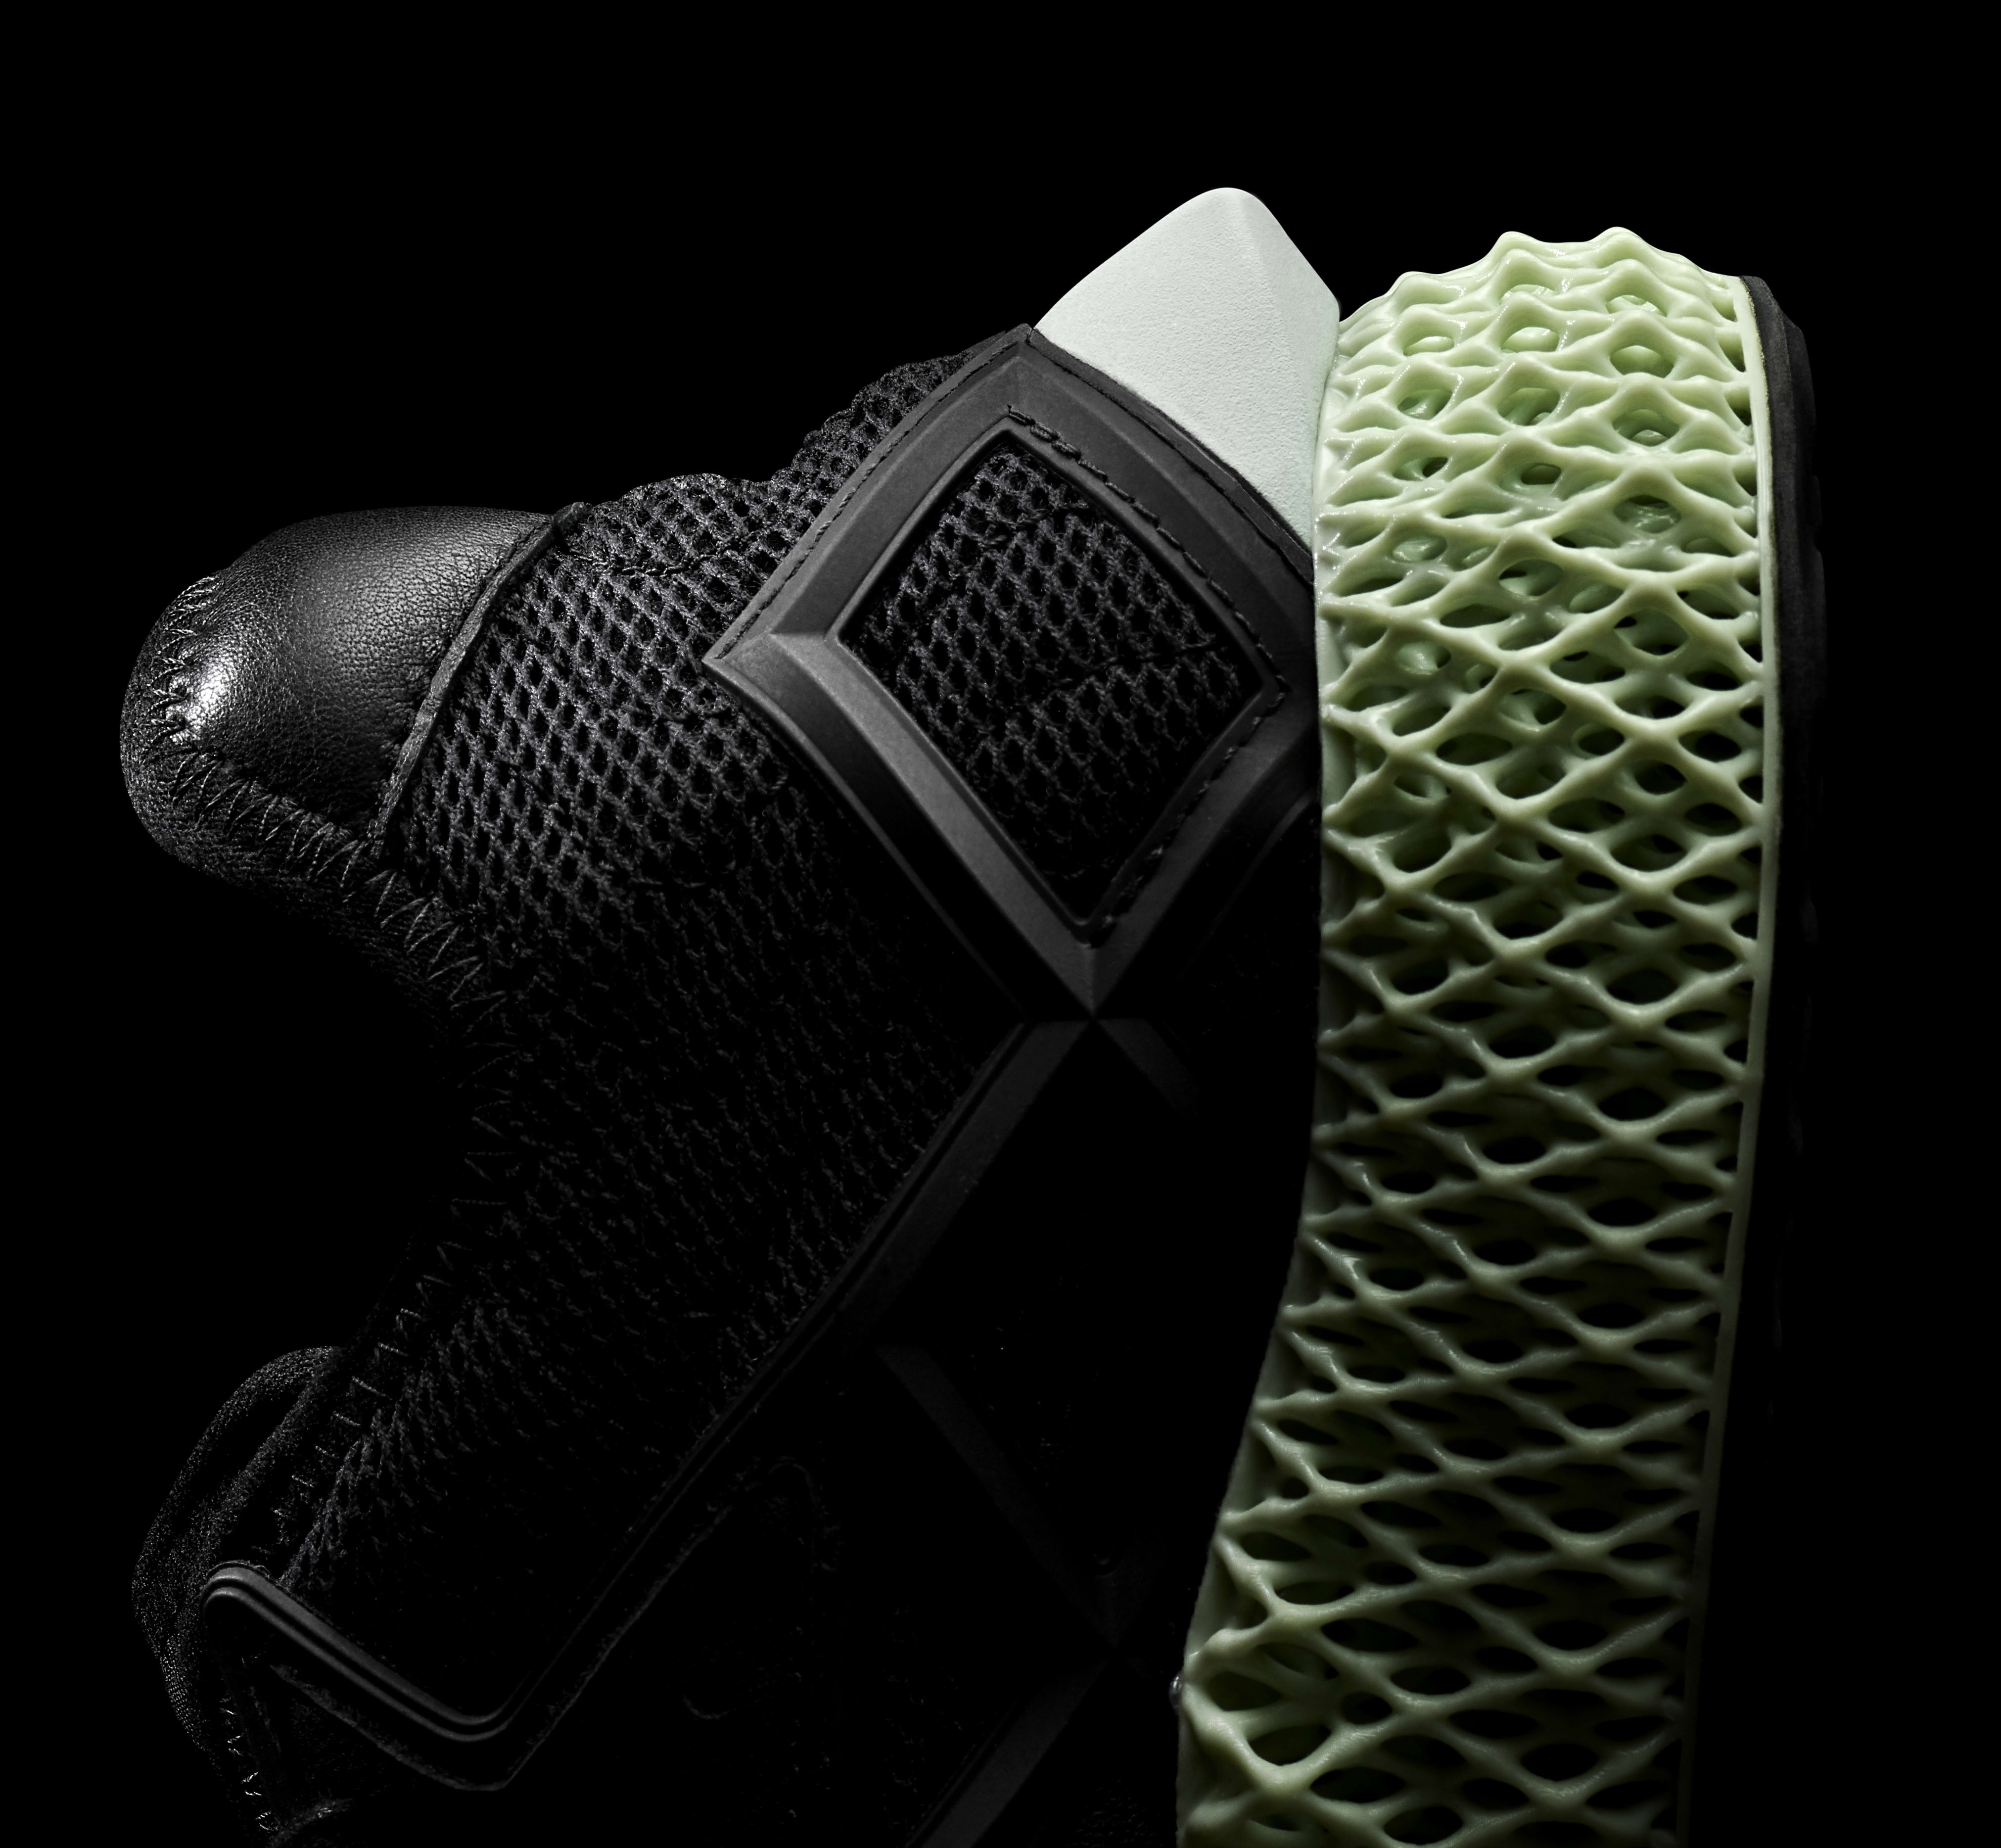 adidas-y-3-runner-4d-2019-heel